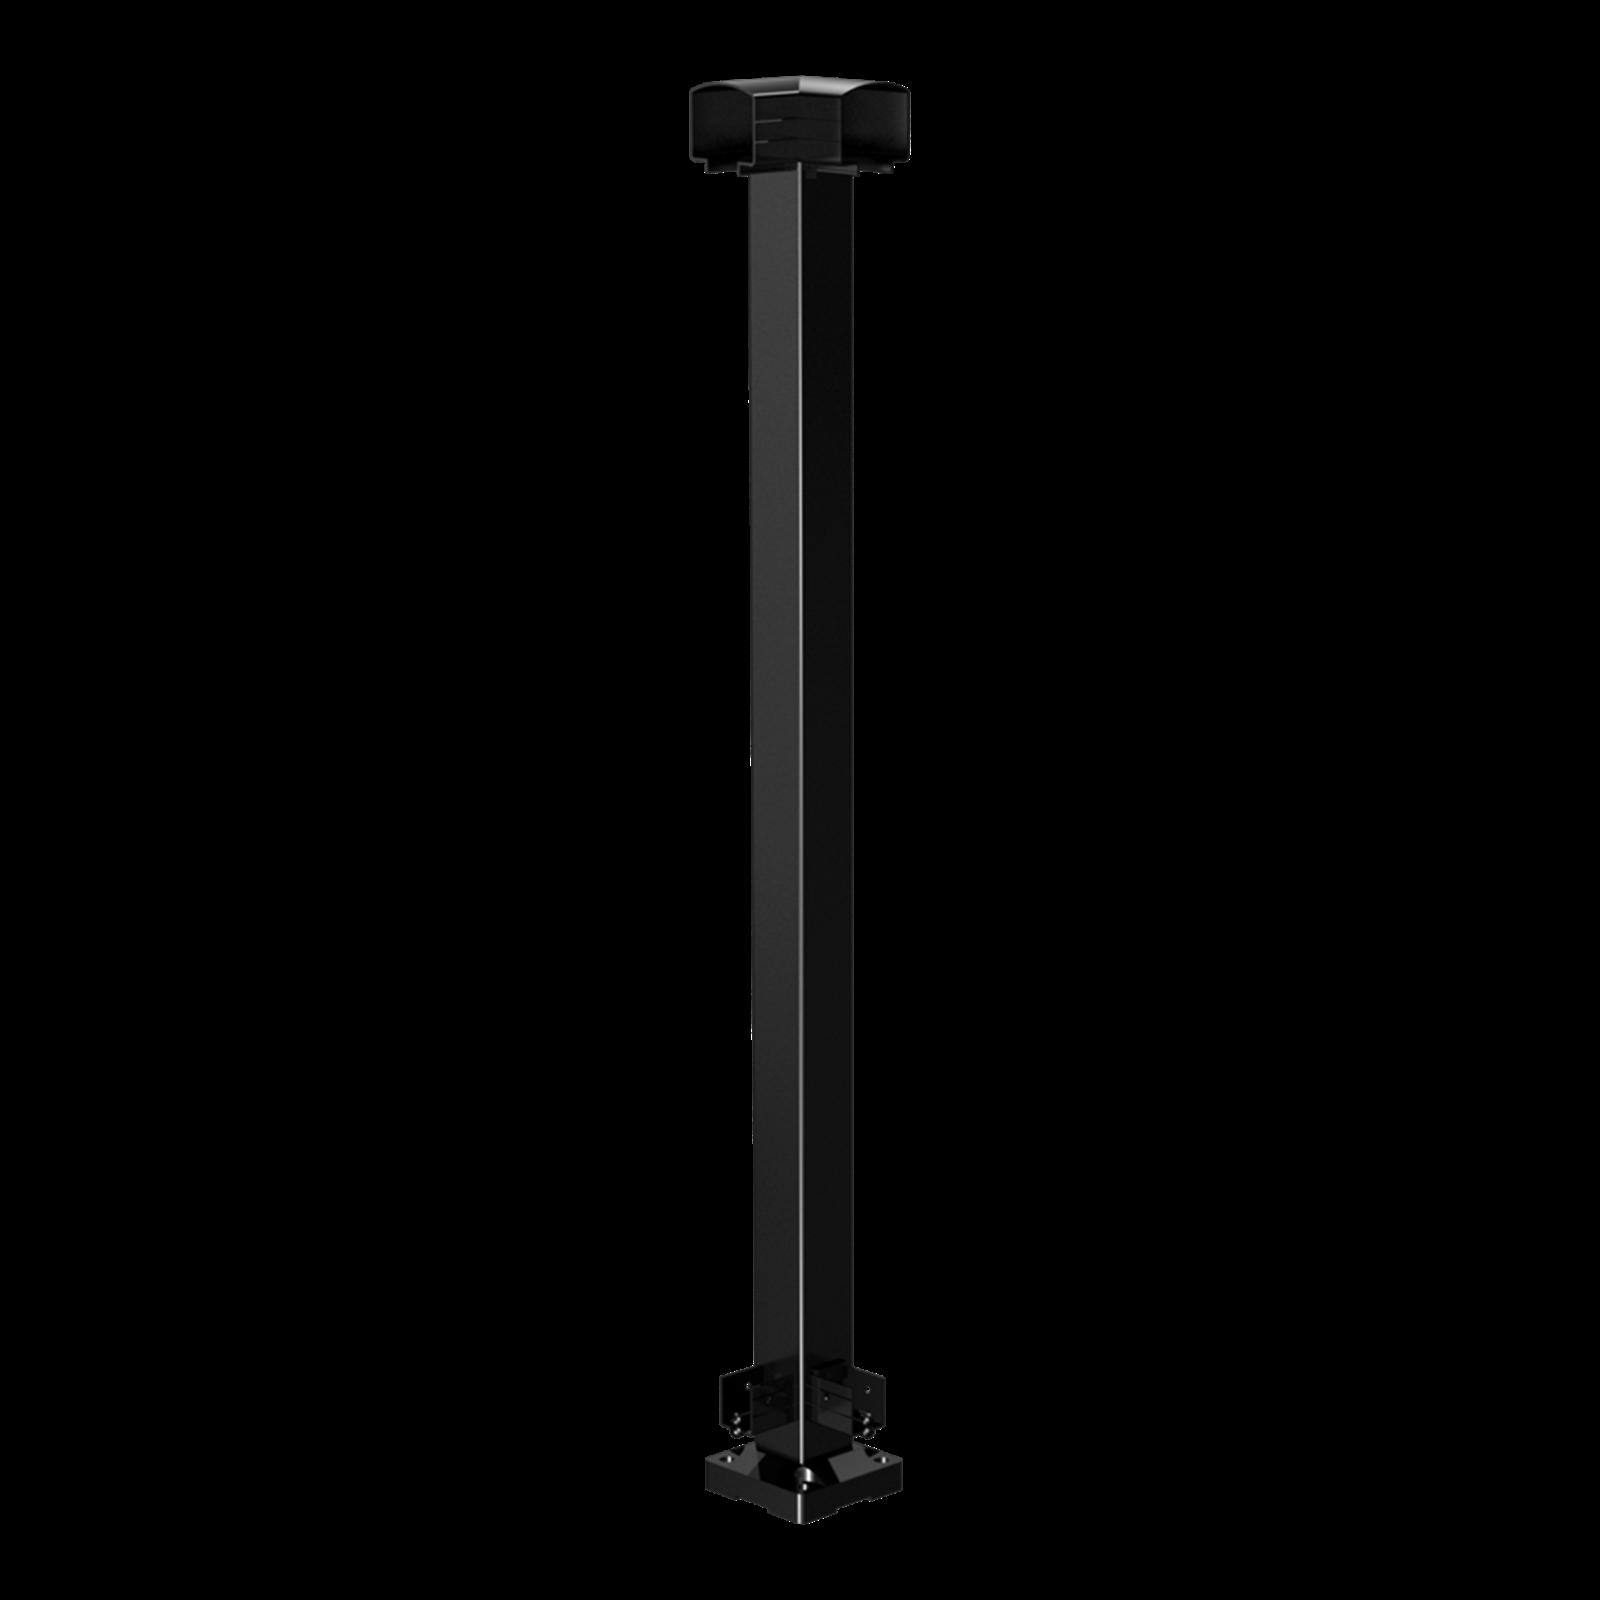 Peak Products 1000mm Black Aluminium Balustrade Corner Post